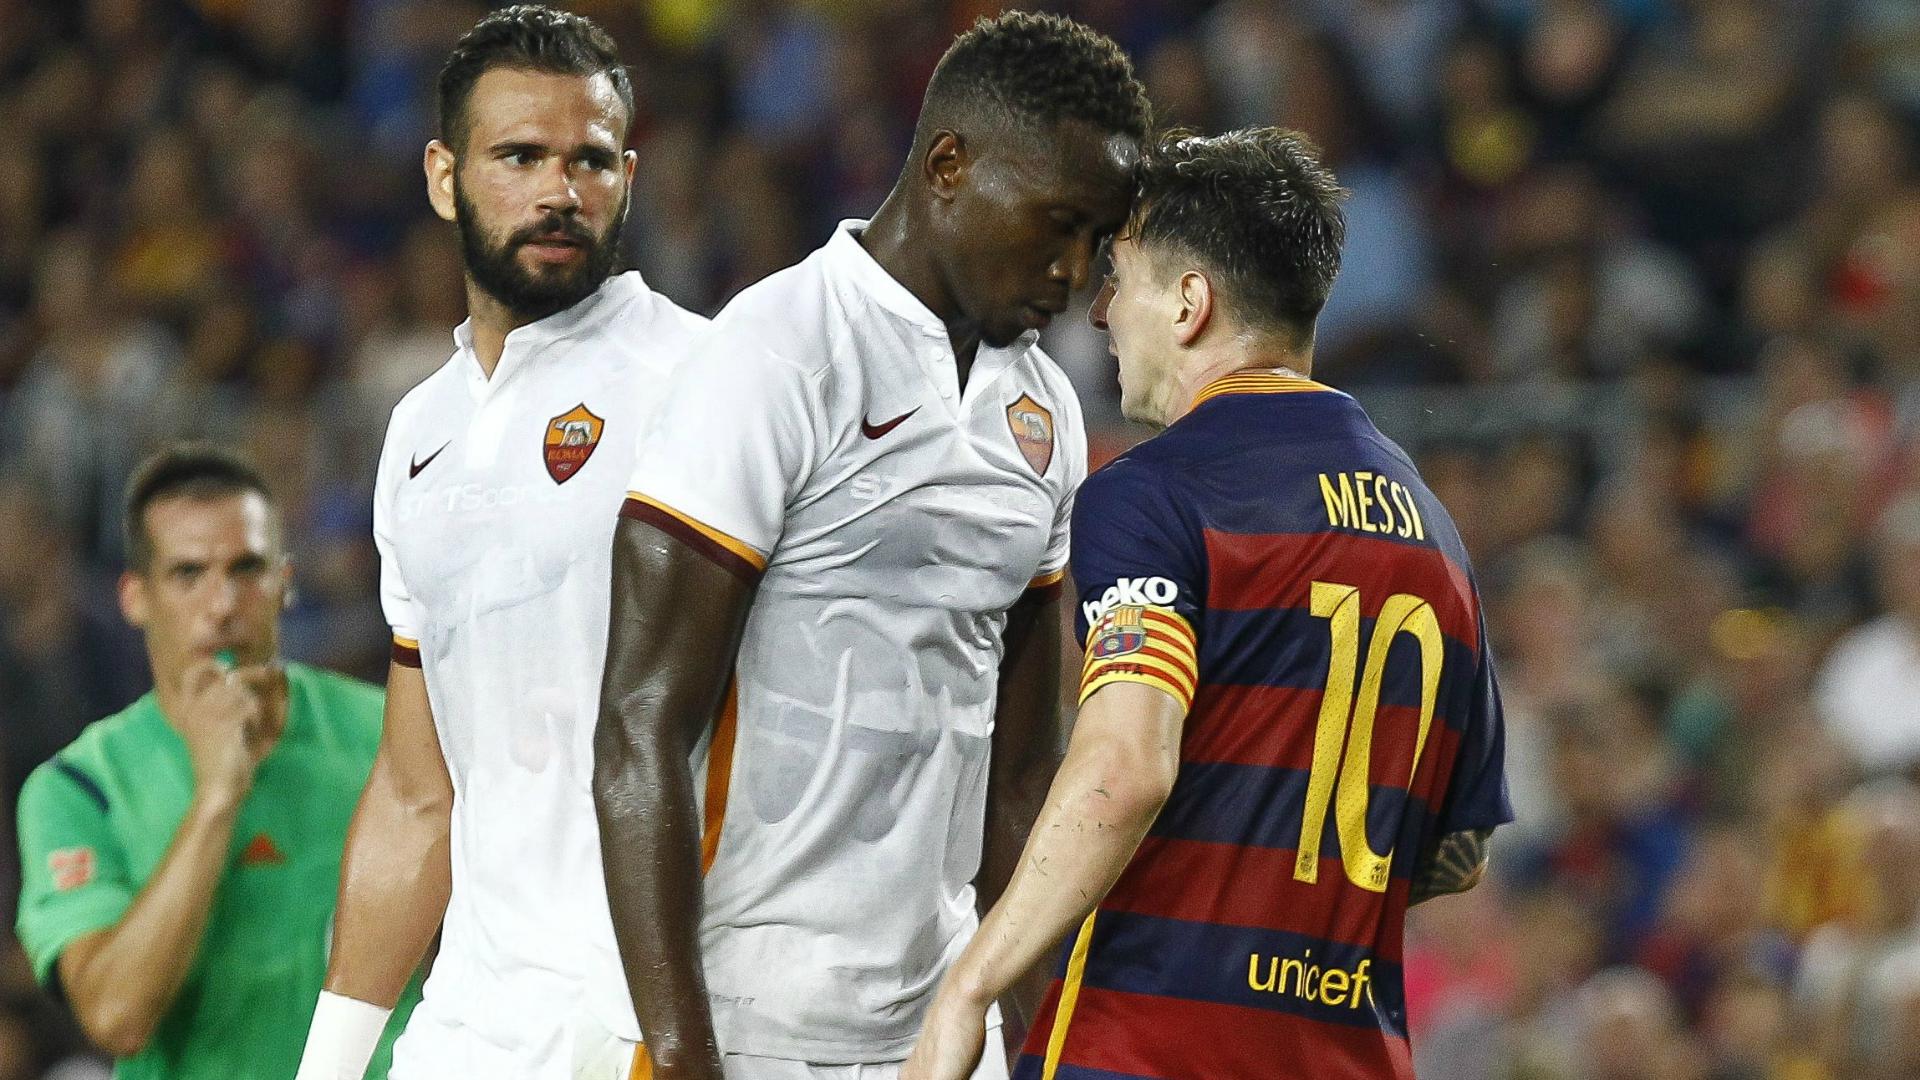 Barcelona: Messi headbutt on Yanga-Mbiwa 'normal'